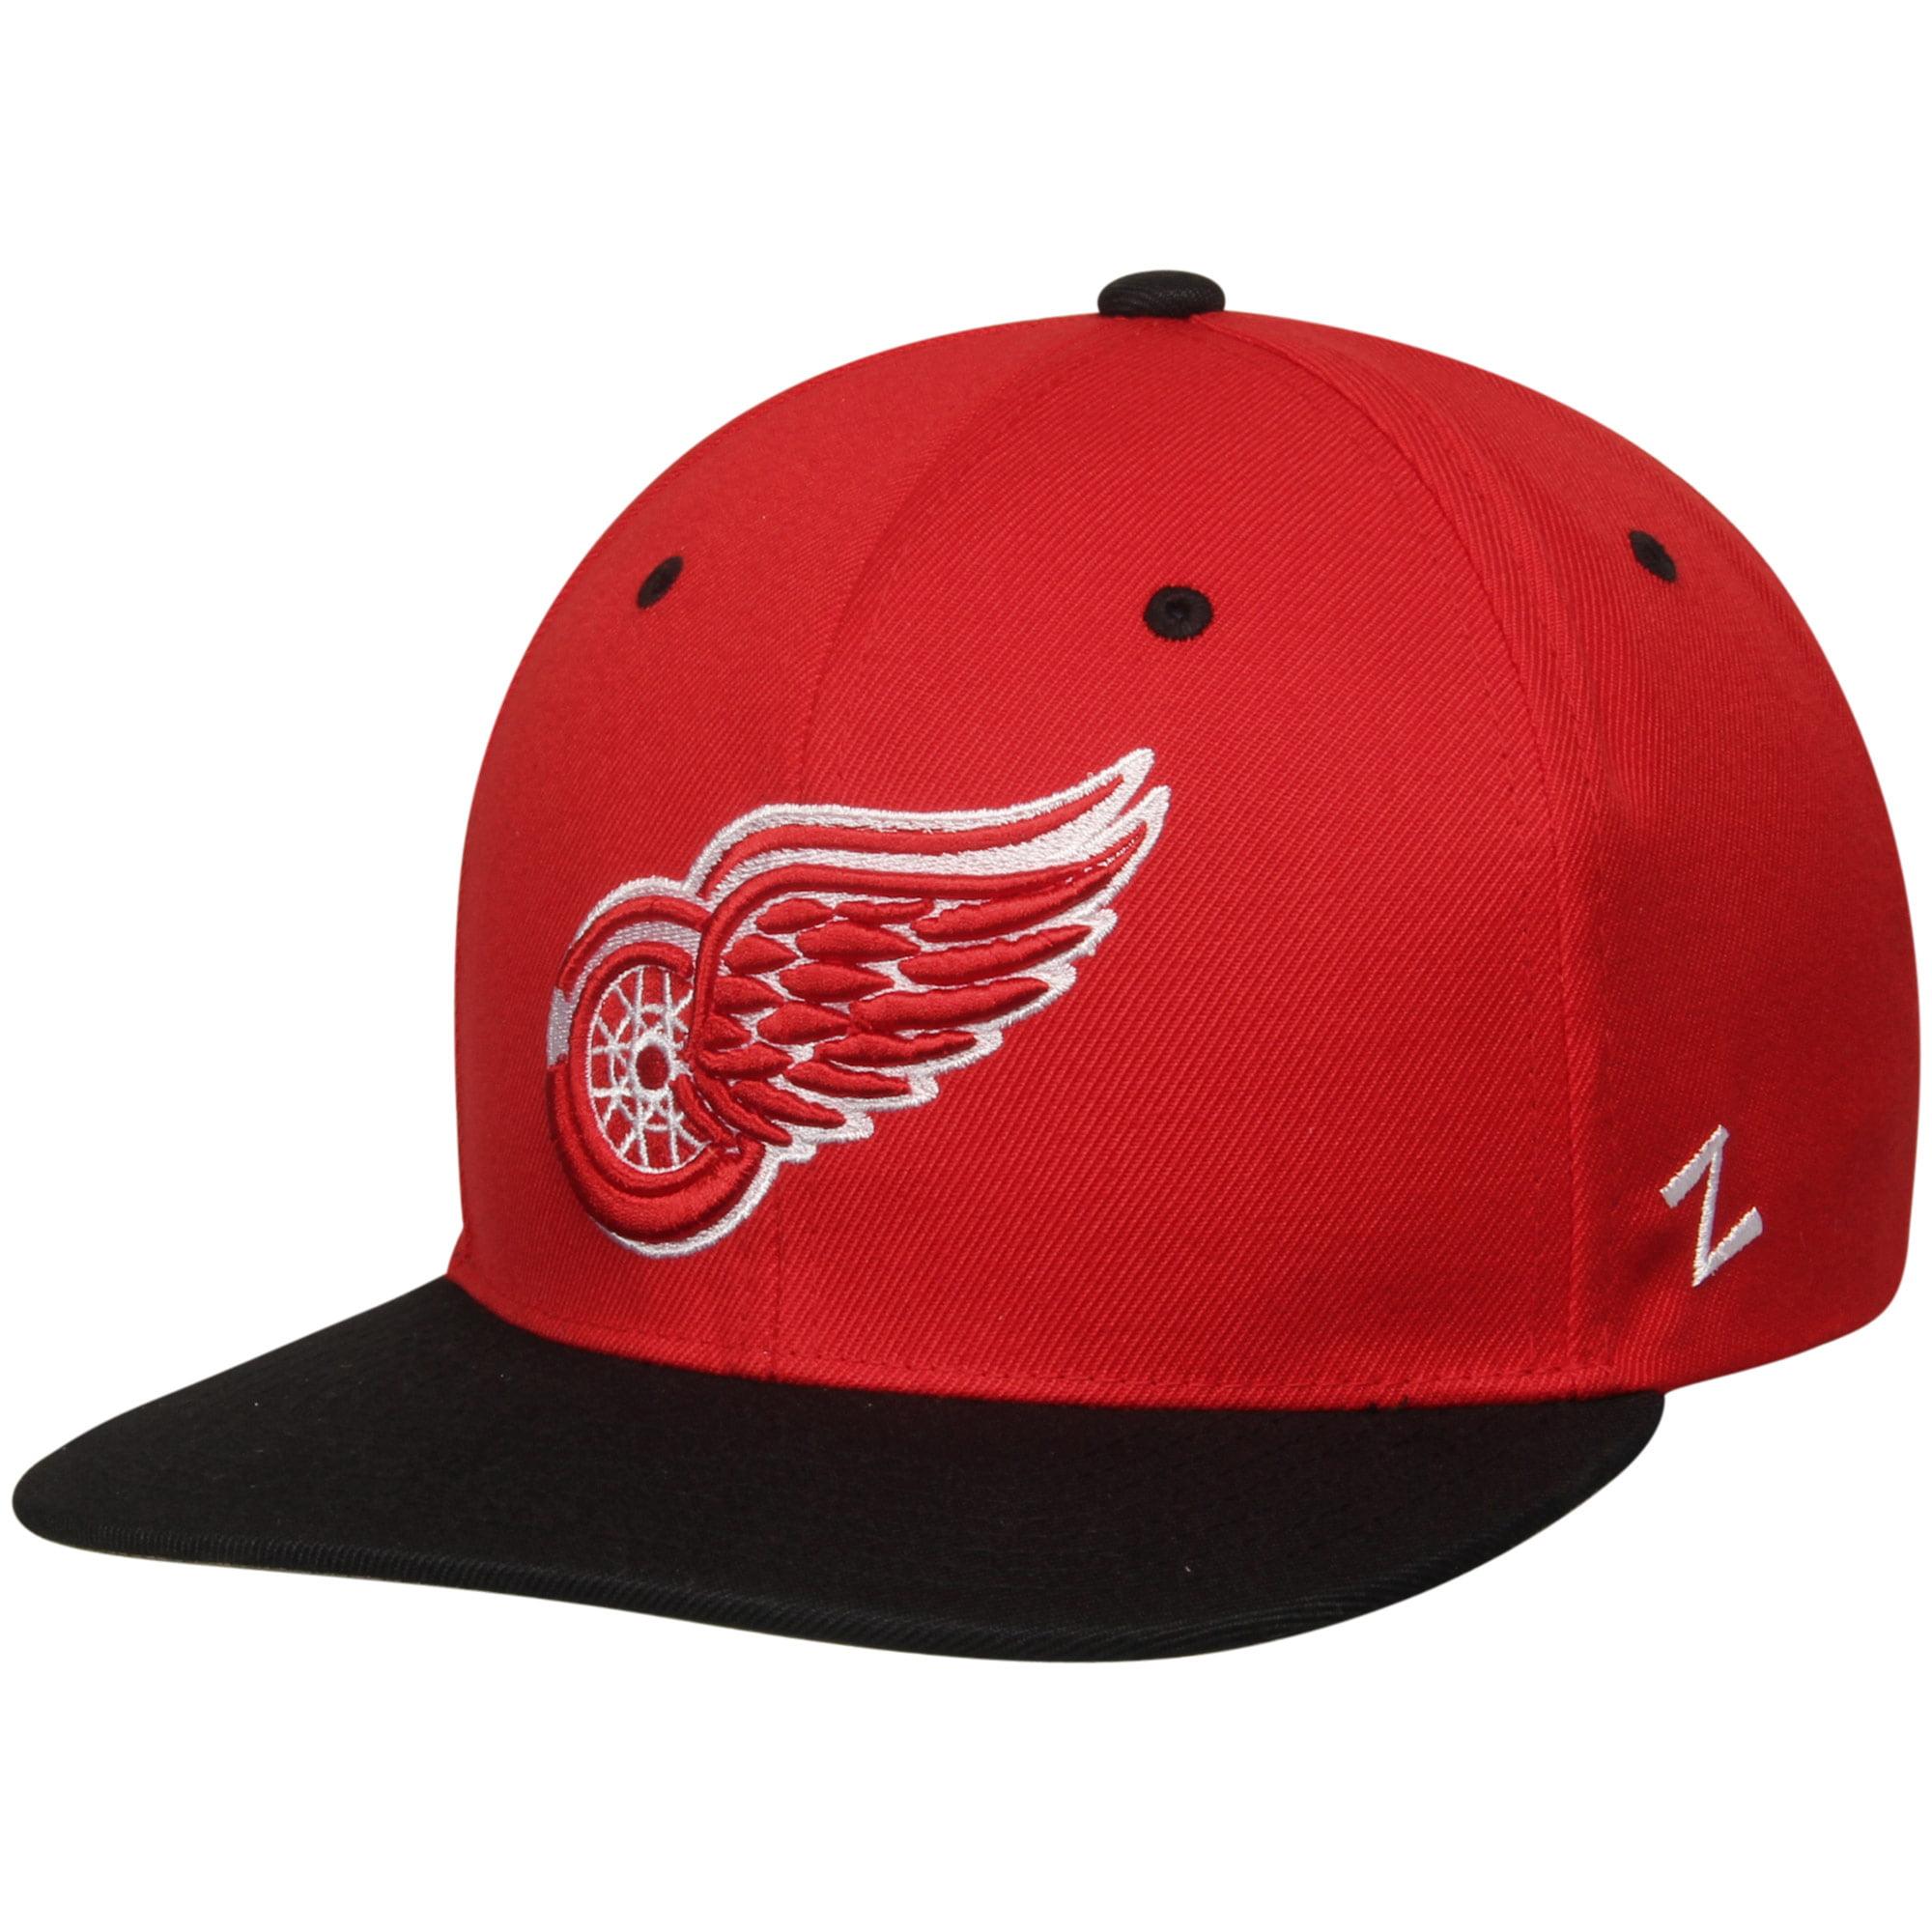 Detroit Red Wings Zephyr Z11 Snapback Adjustable Hat - Red/Black - OSFA